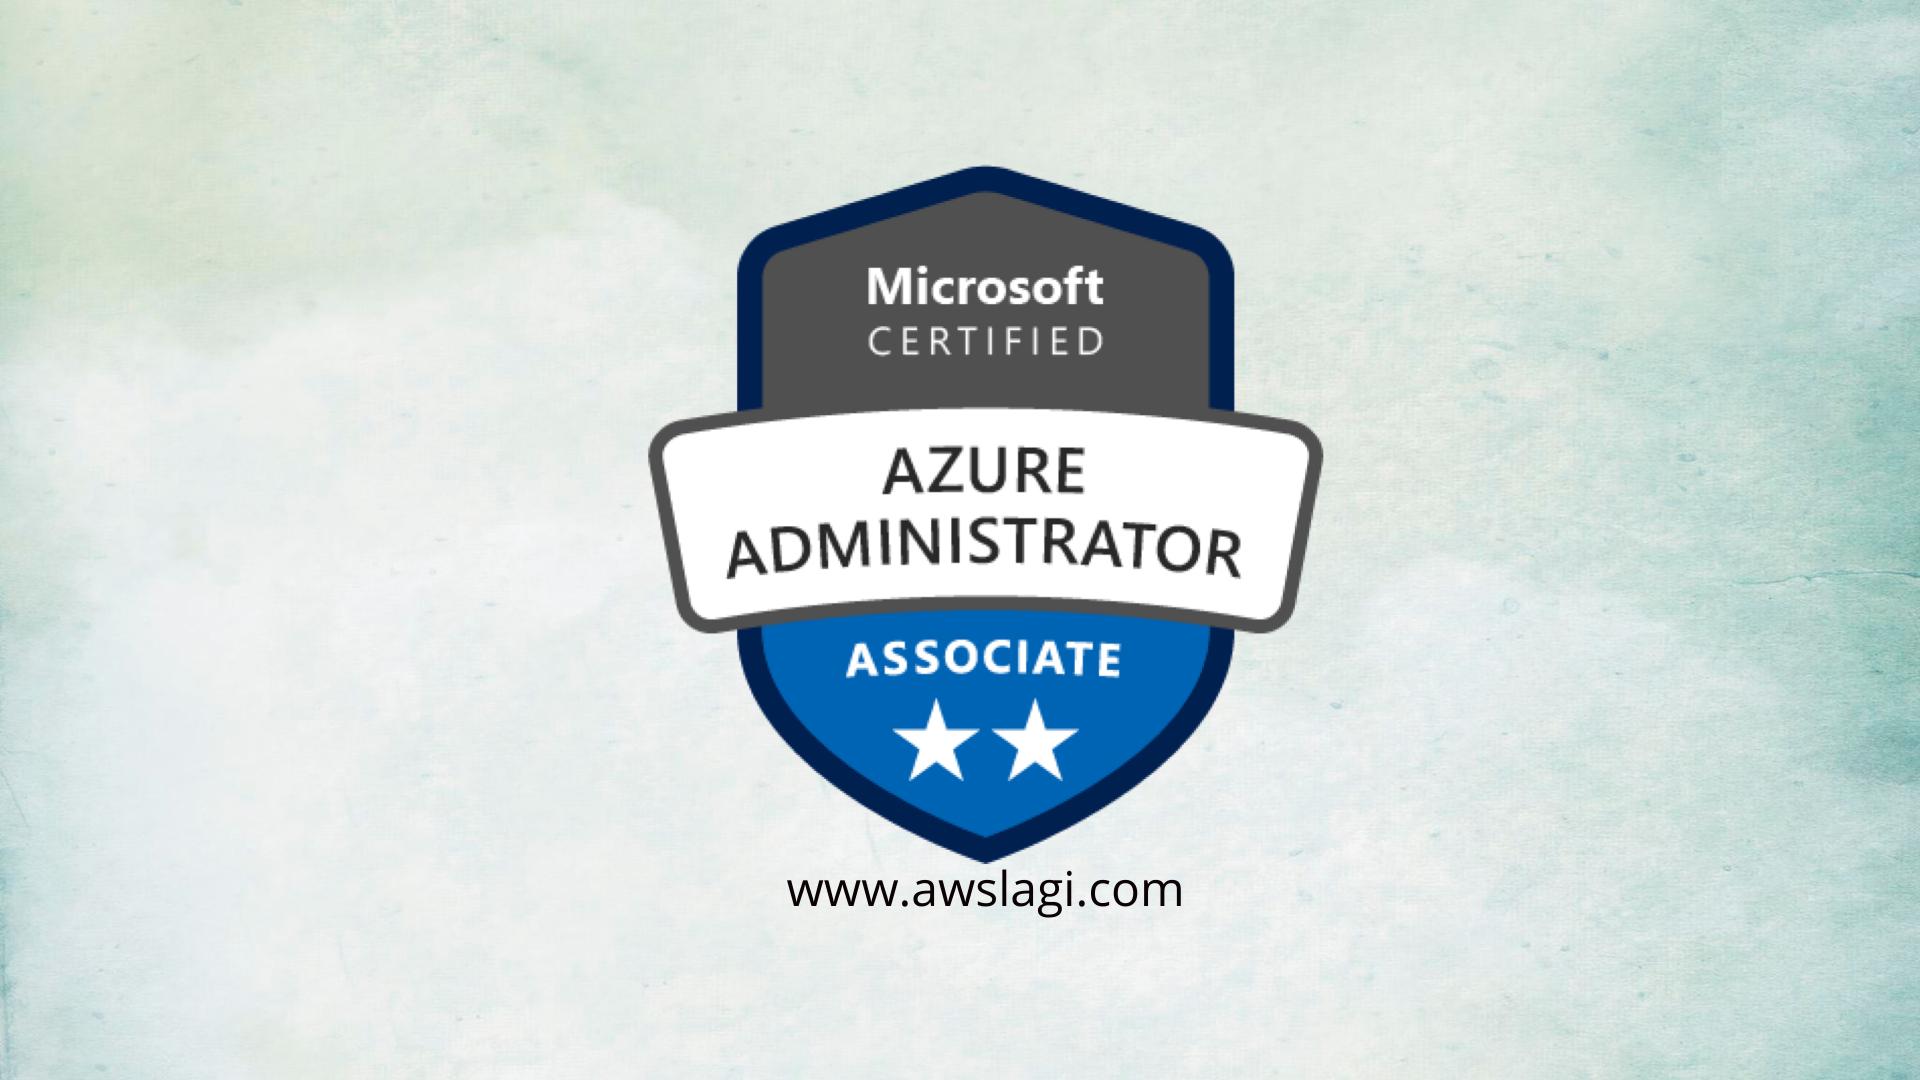 microsoft-azure-certified-administrator-associate-az-104-actual-exam-logo